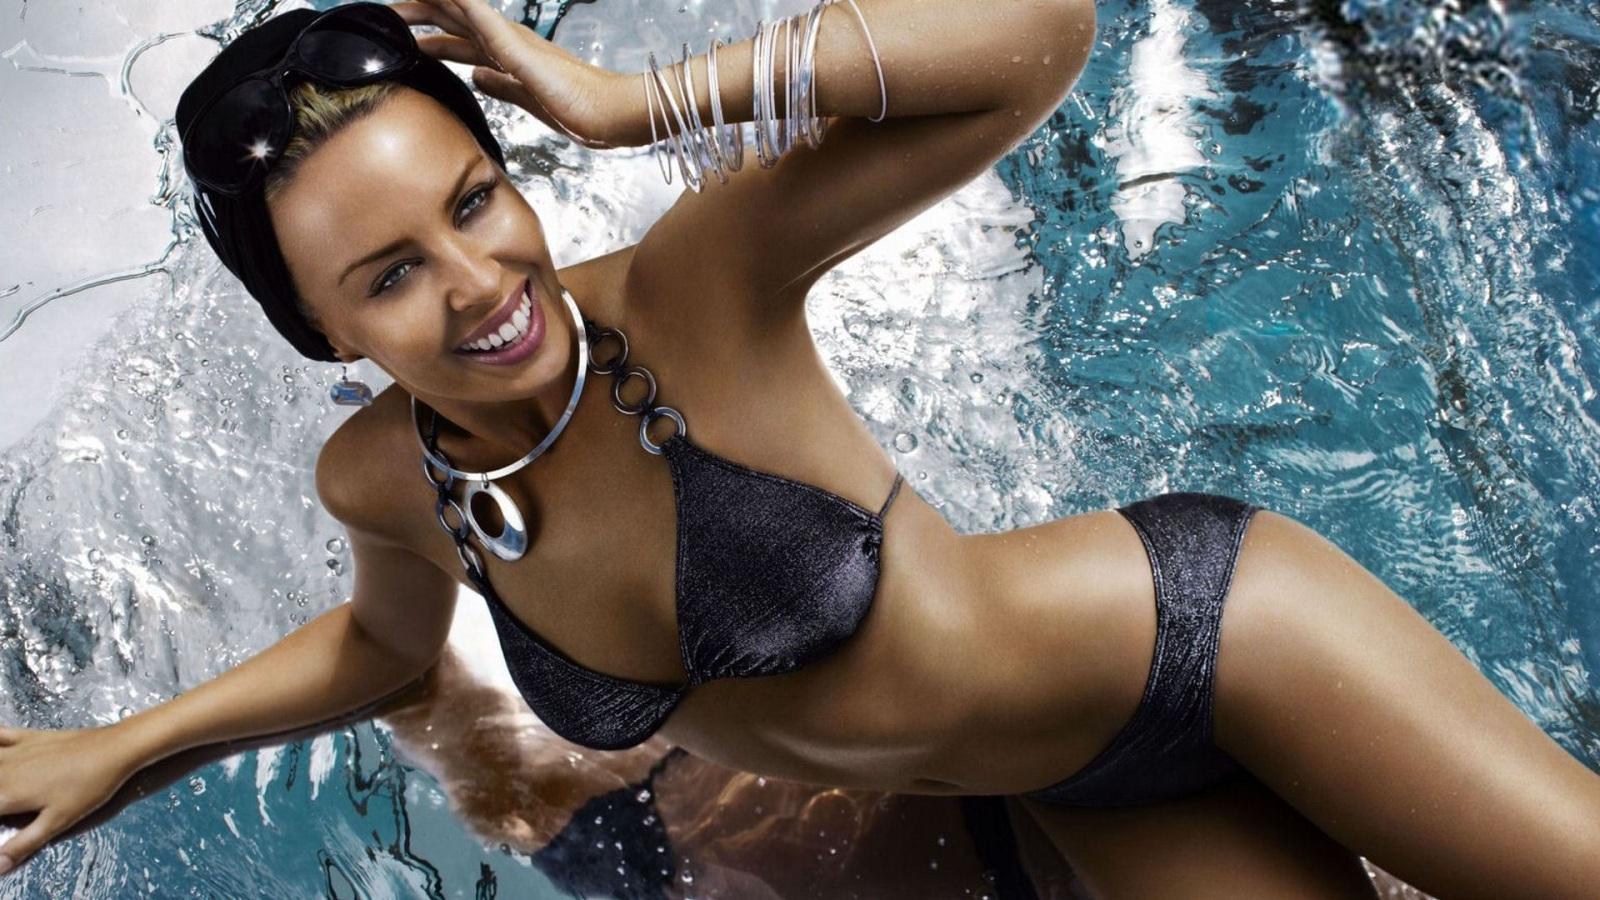 http://2.bp.blogspot.com/-5N39fLkb9vk/UA_HfUDEqII/AAAAAAAAAm8/YA89_CnYu9M/s1600/desktop-celebrity-babe-hot-bikini-wallpapers-hd-sexy-bikini-wallpaper-kylie-minogue-grey-silver-bikini-hotmoviepictures-com%2B(3).jpg